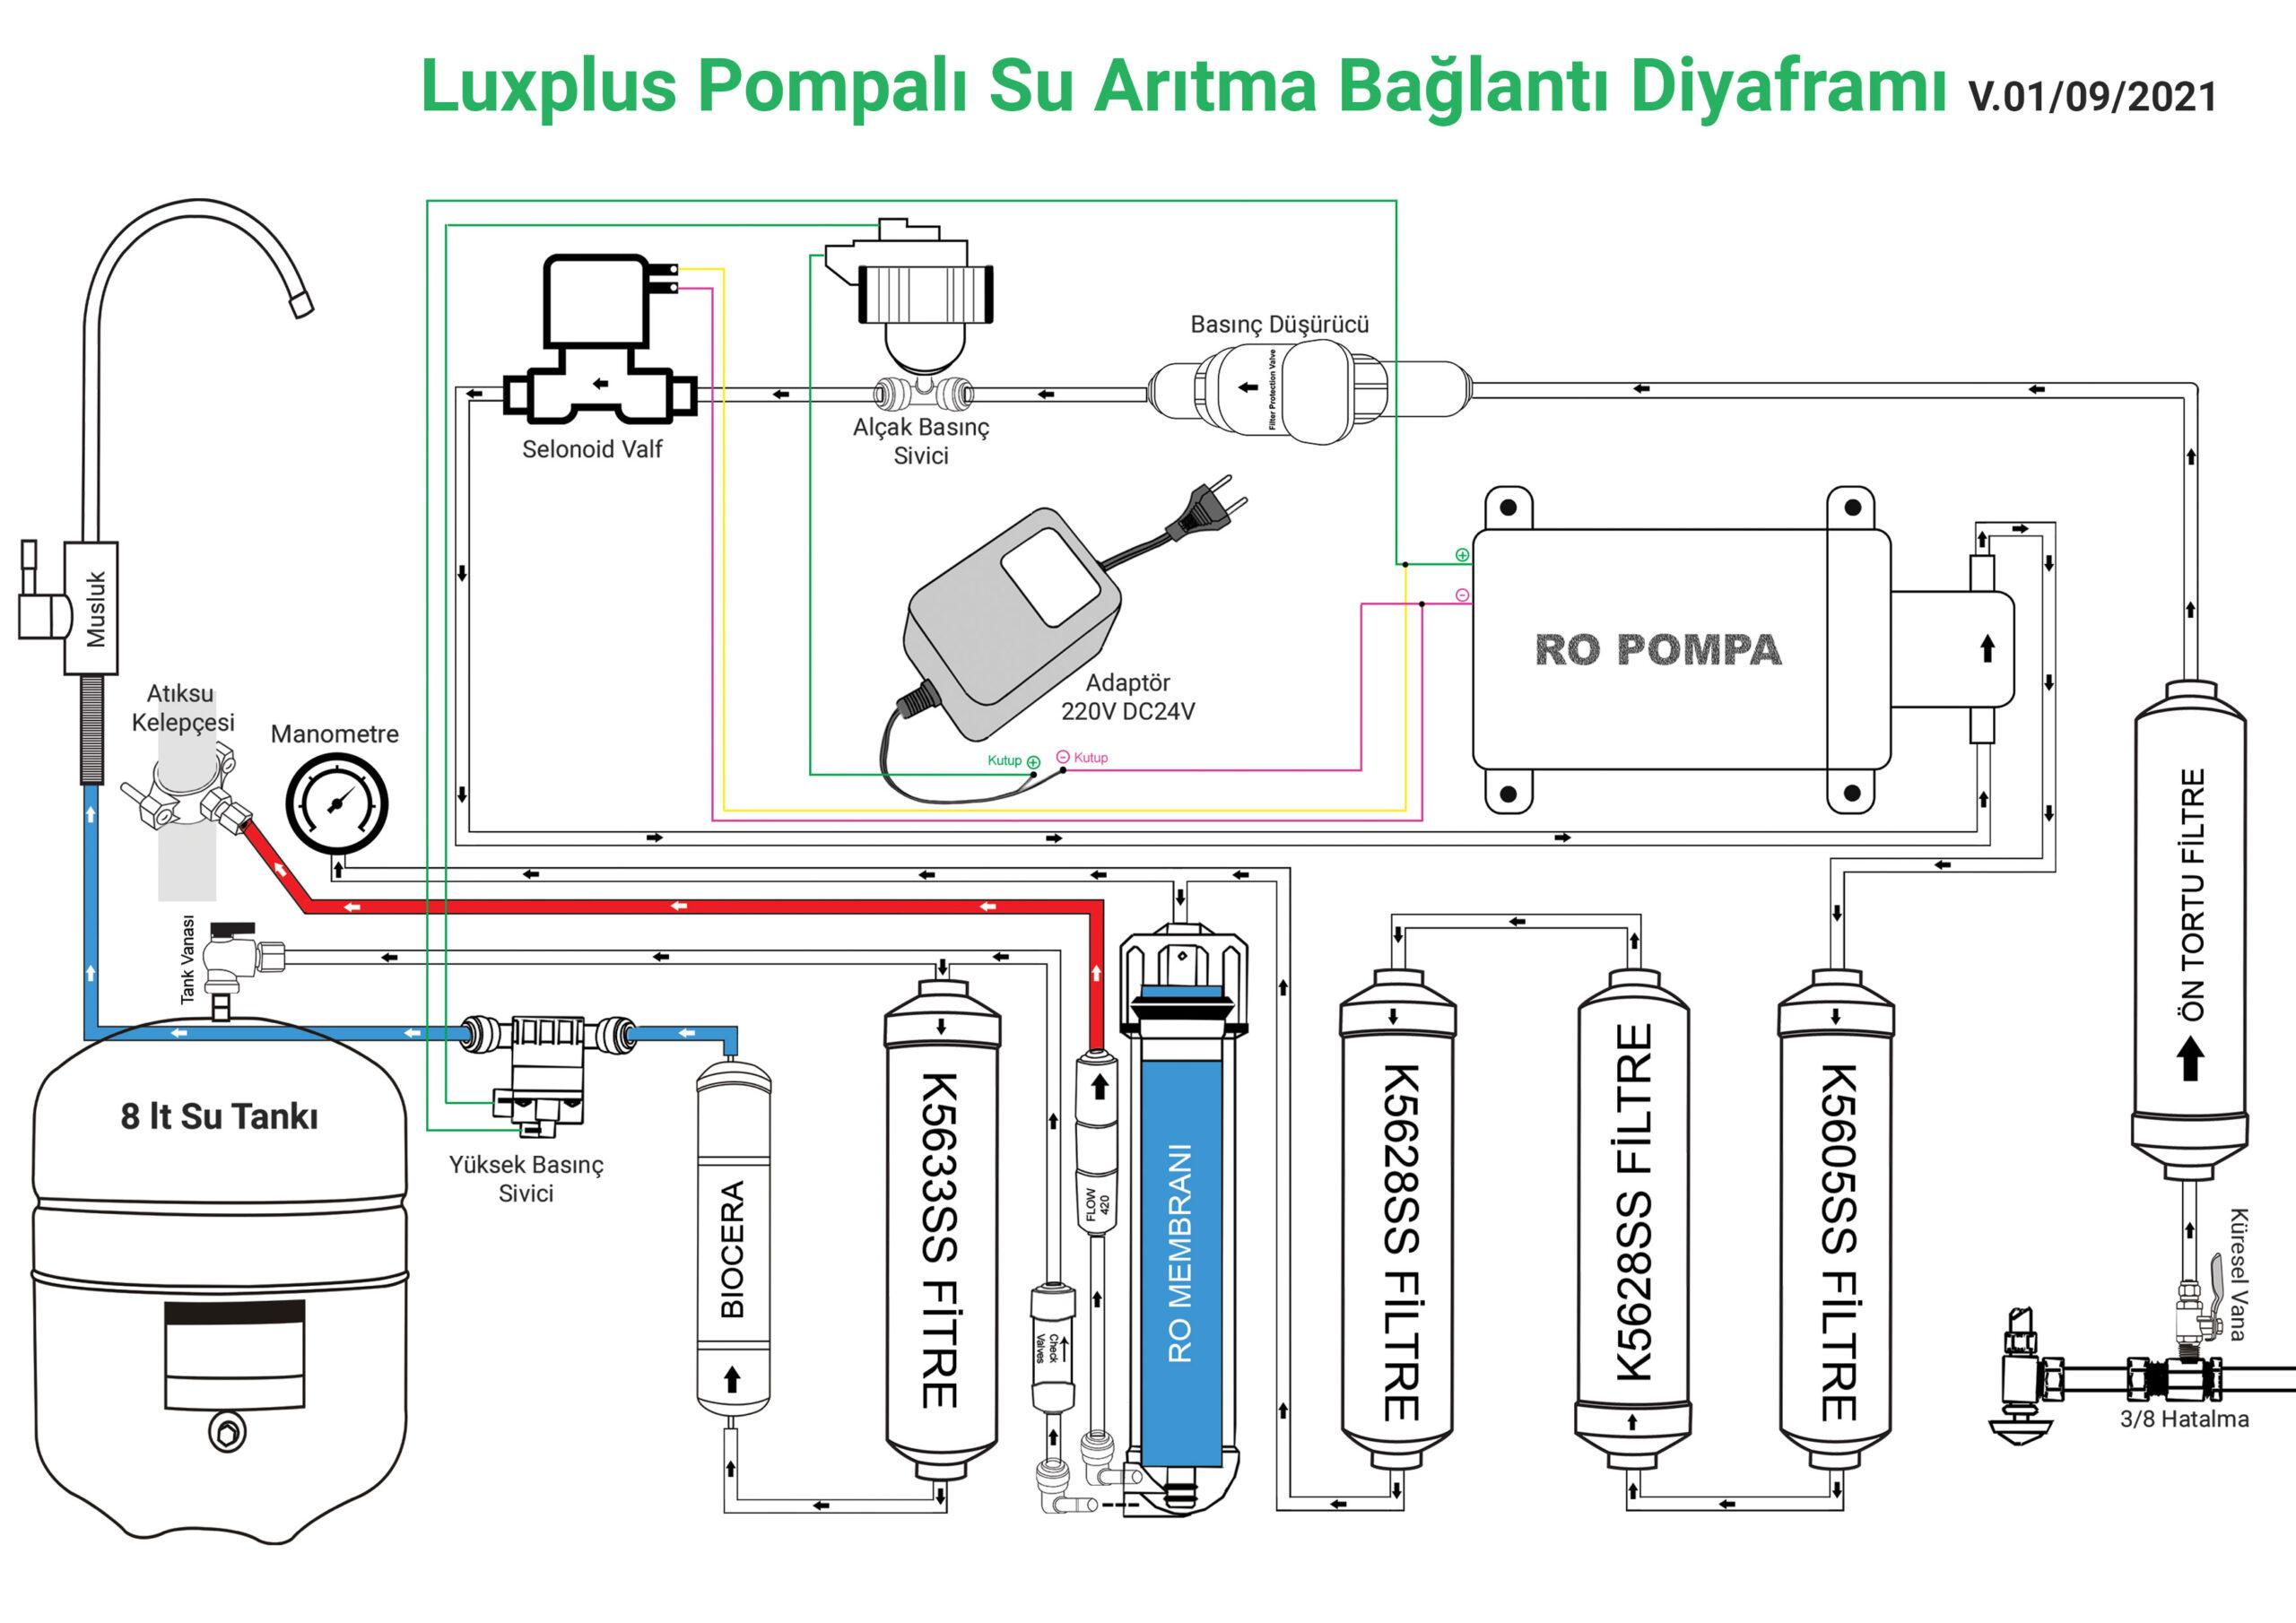 Luxplus su arıtma cihazı bağlantı şeması (Diyaframı)